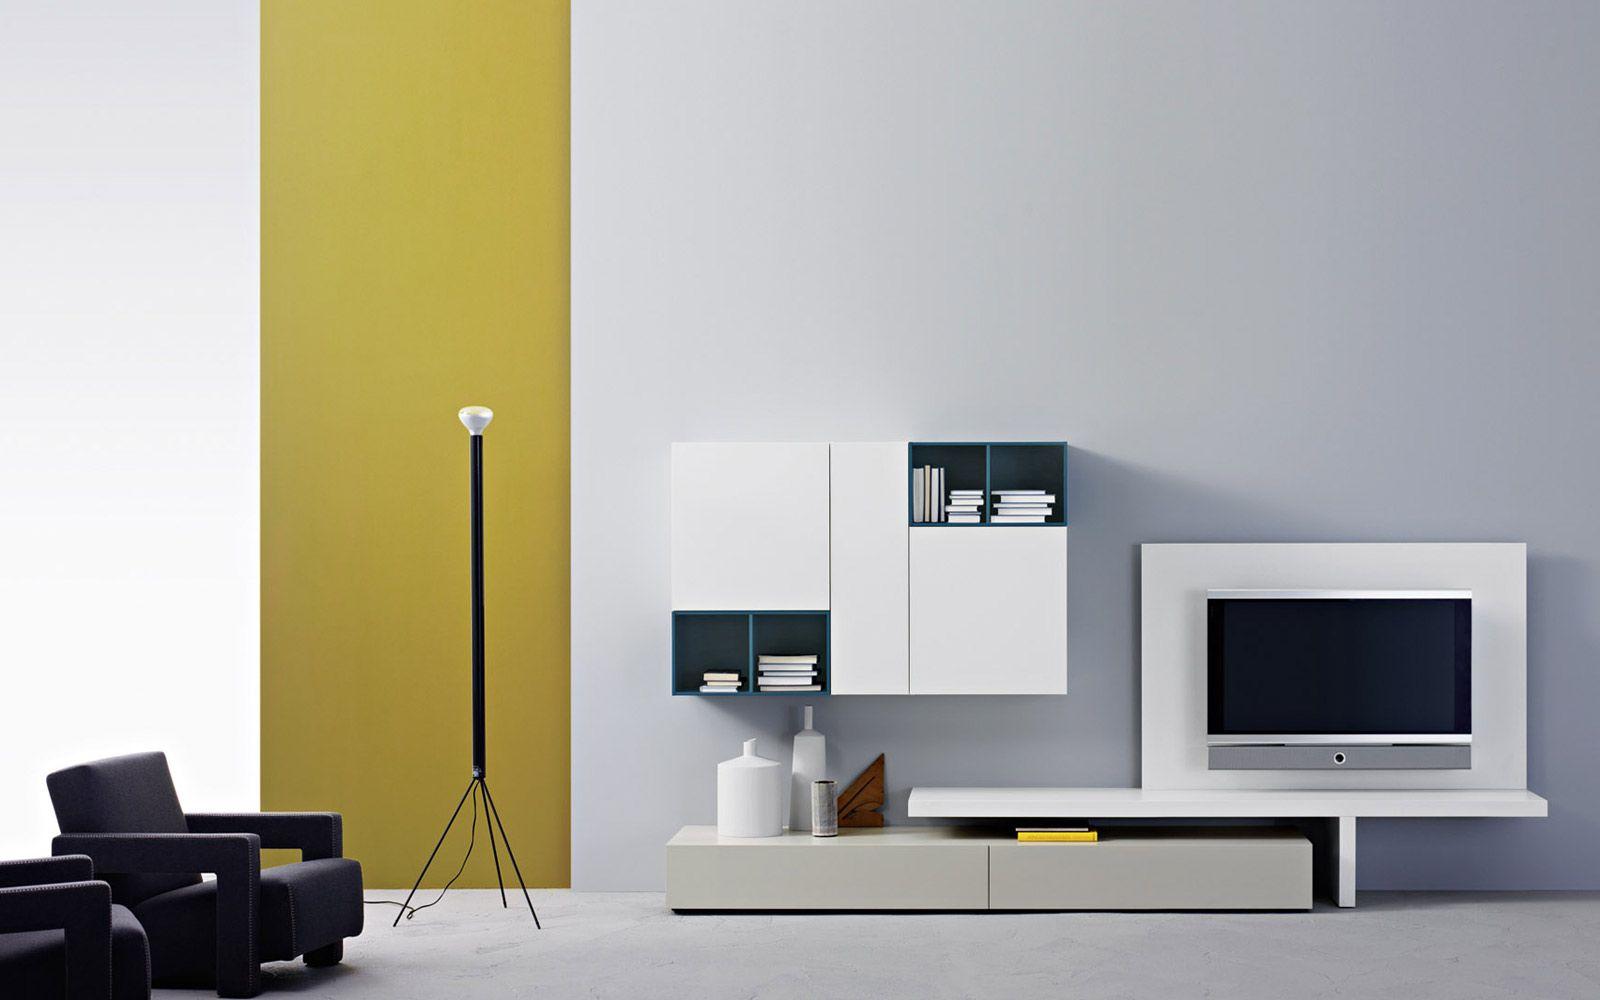 tv wand lampo l2 22 jetzt bestellen unter. Black Bedroom Furniture Sets. Home Design Ideas